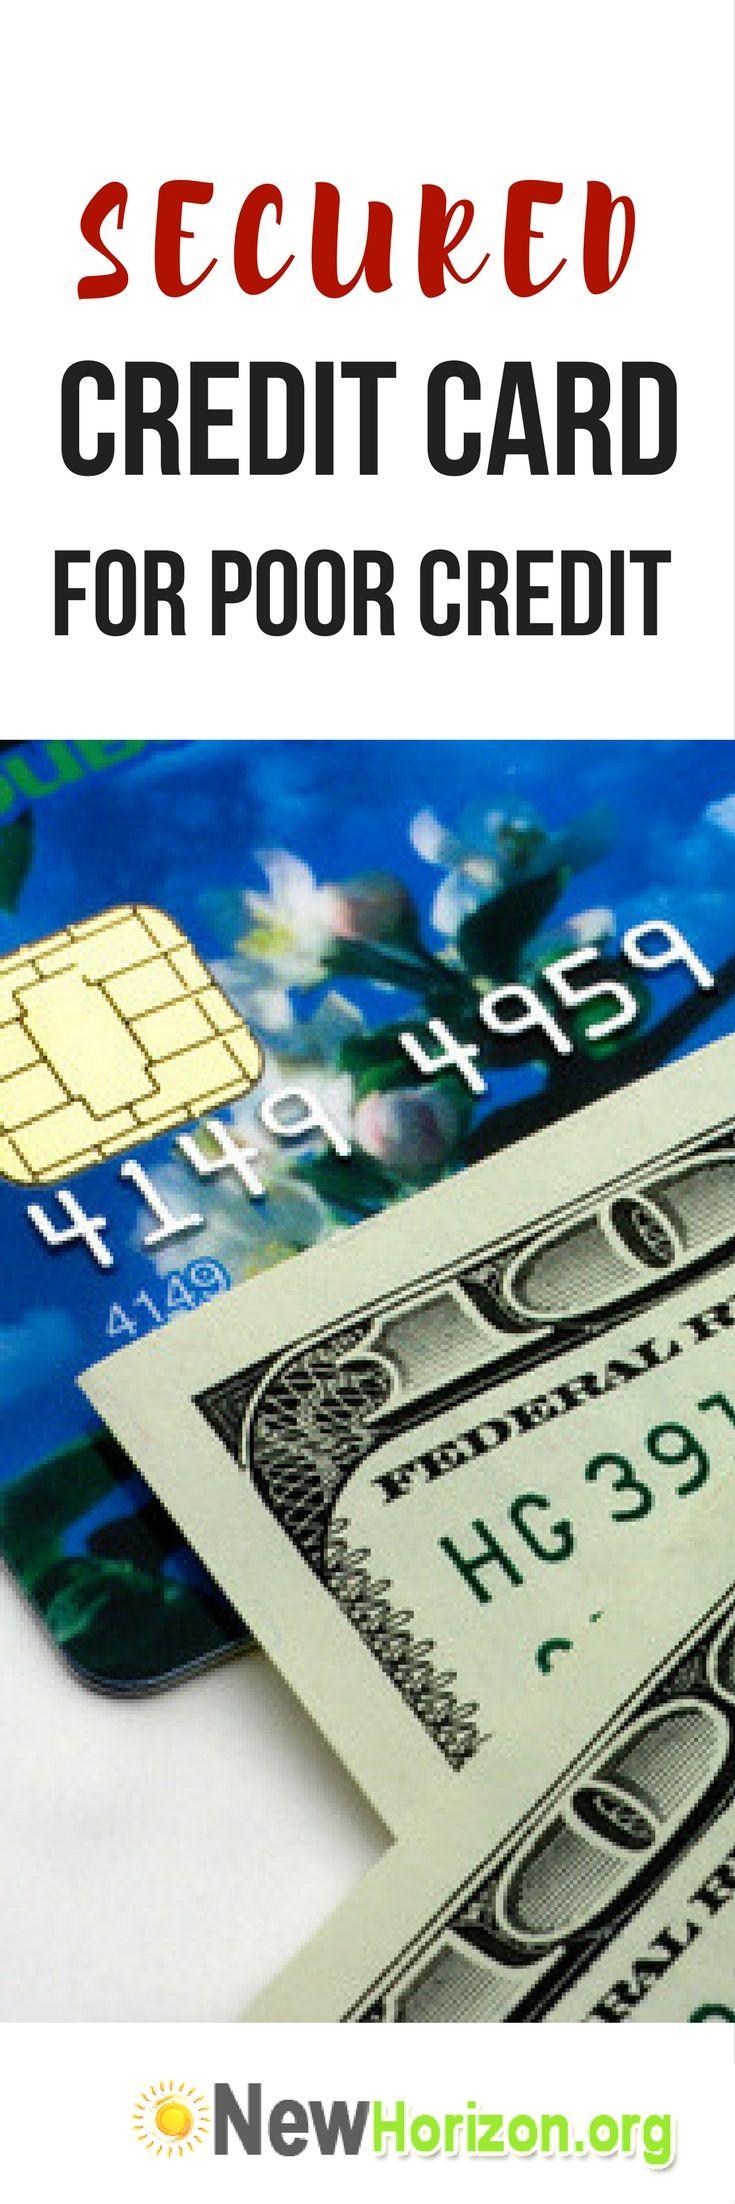 List of Secured Credit Card For Bad Credit.